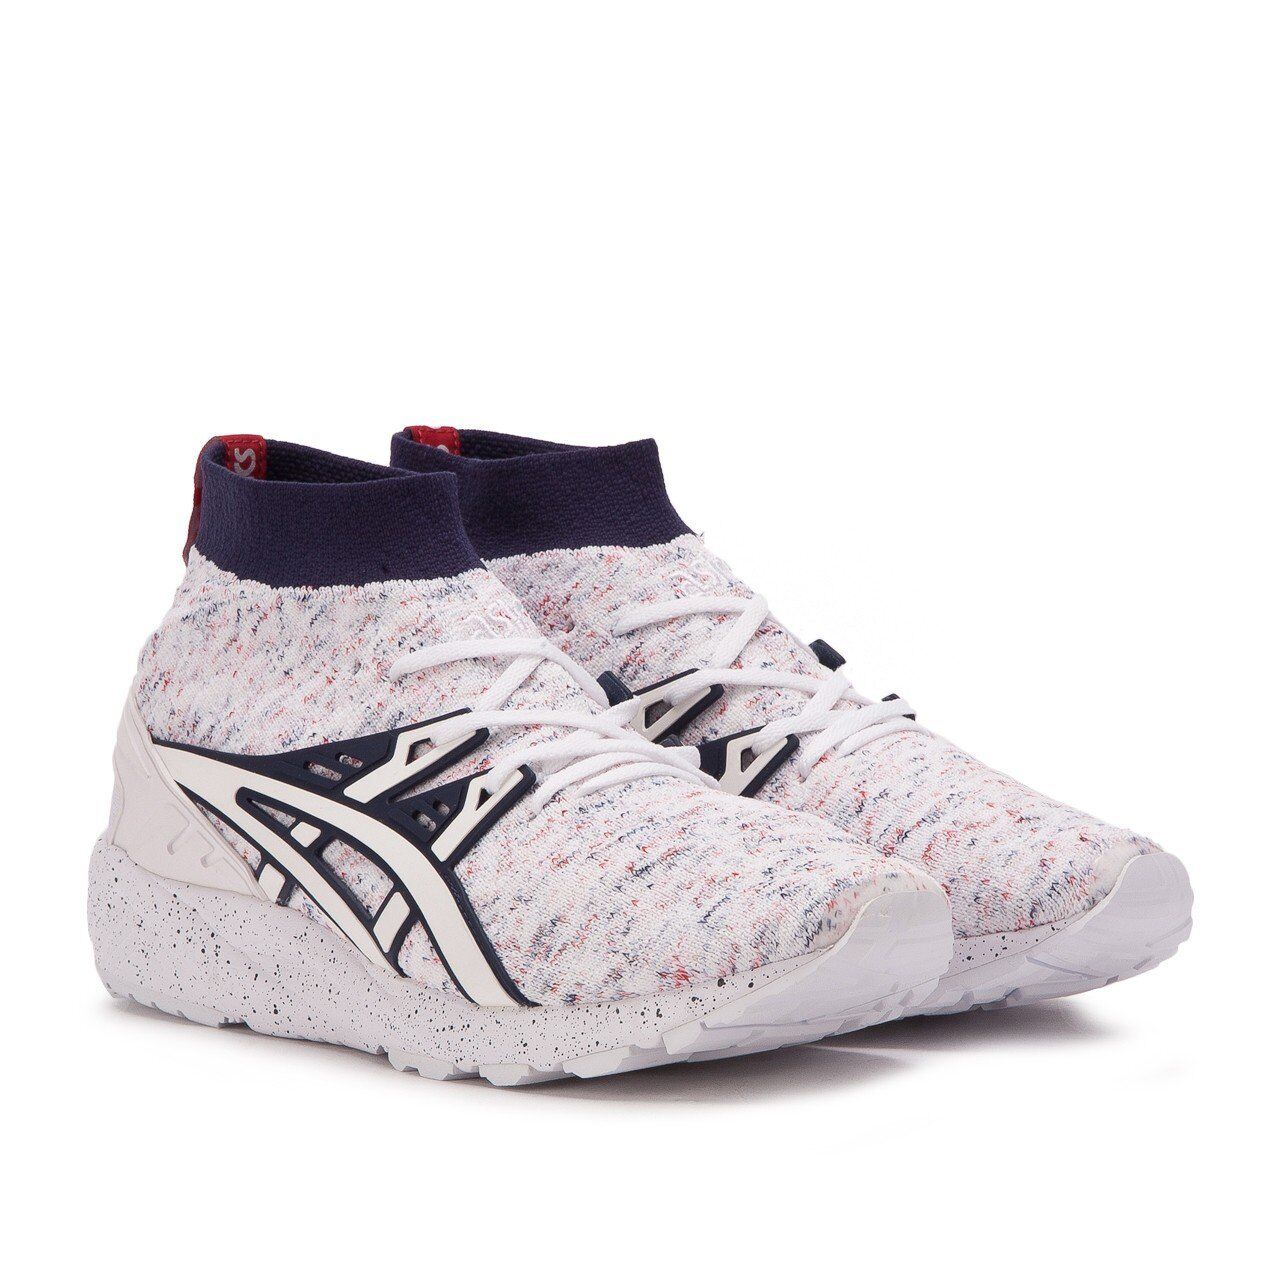 ASICS Tiger Gel-Kayano Trainer Knit MT Men's Cross Training Sneakers 9 (New)